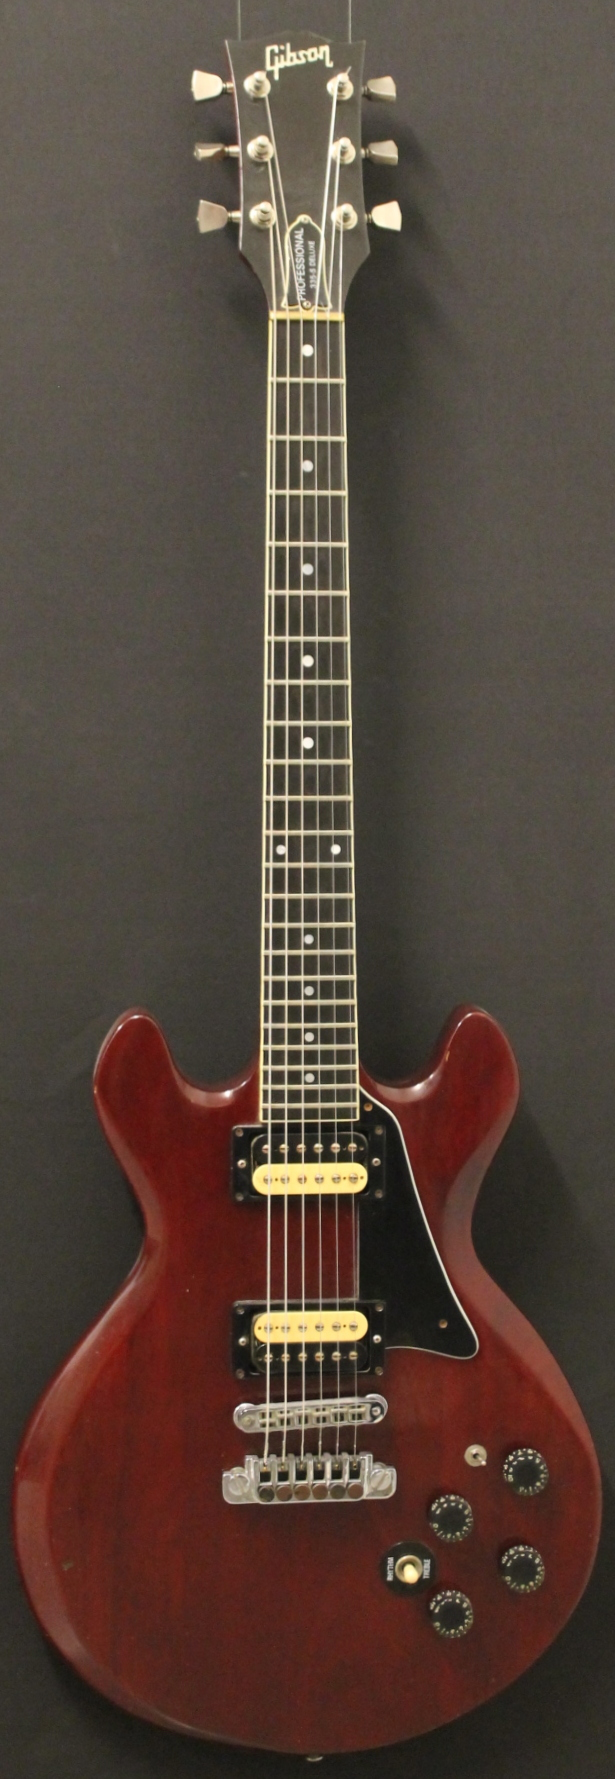 gibson 335 s deluxe professional 1980 guitar for sale kitarakuu. Black Bedroom Furniture Sets. Home Design Ideas